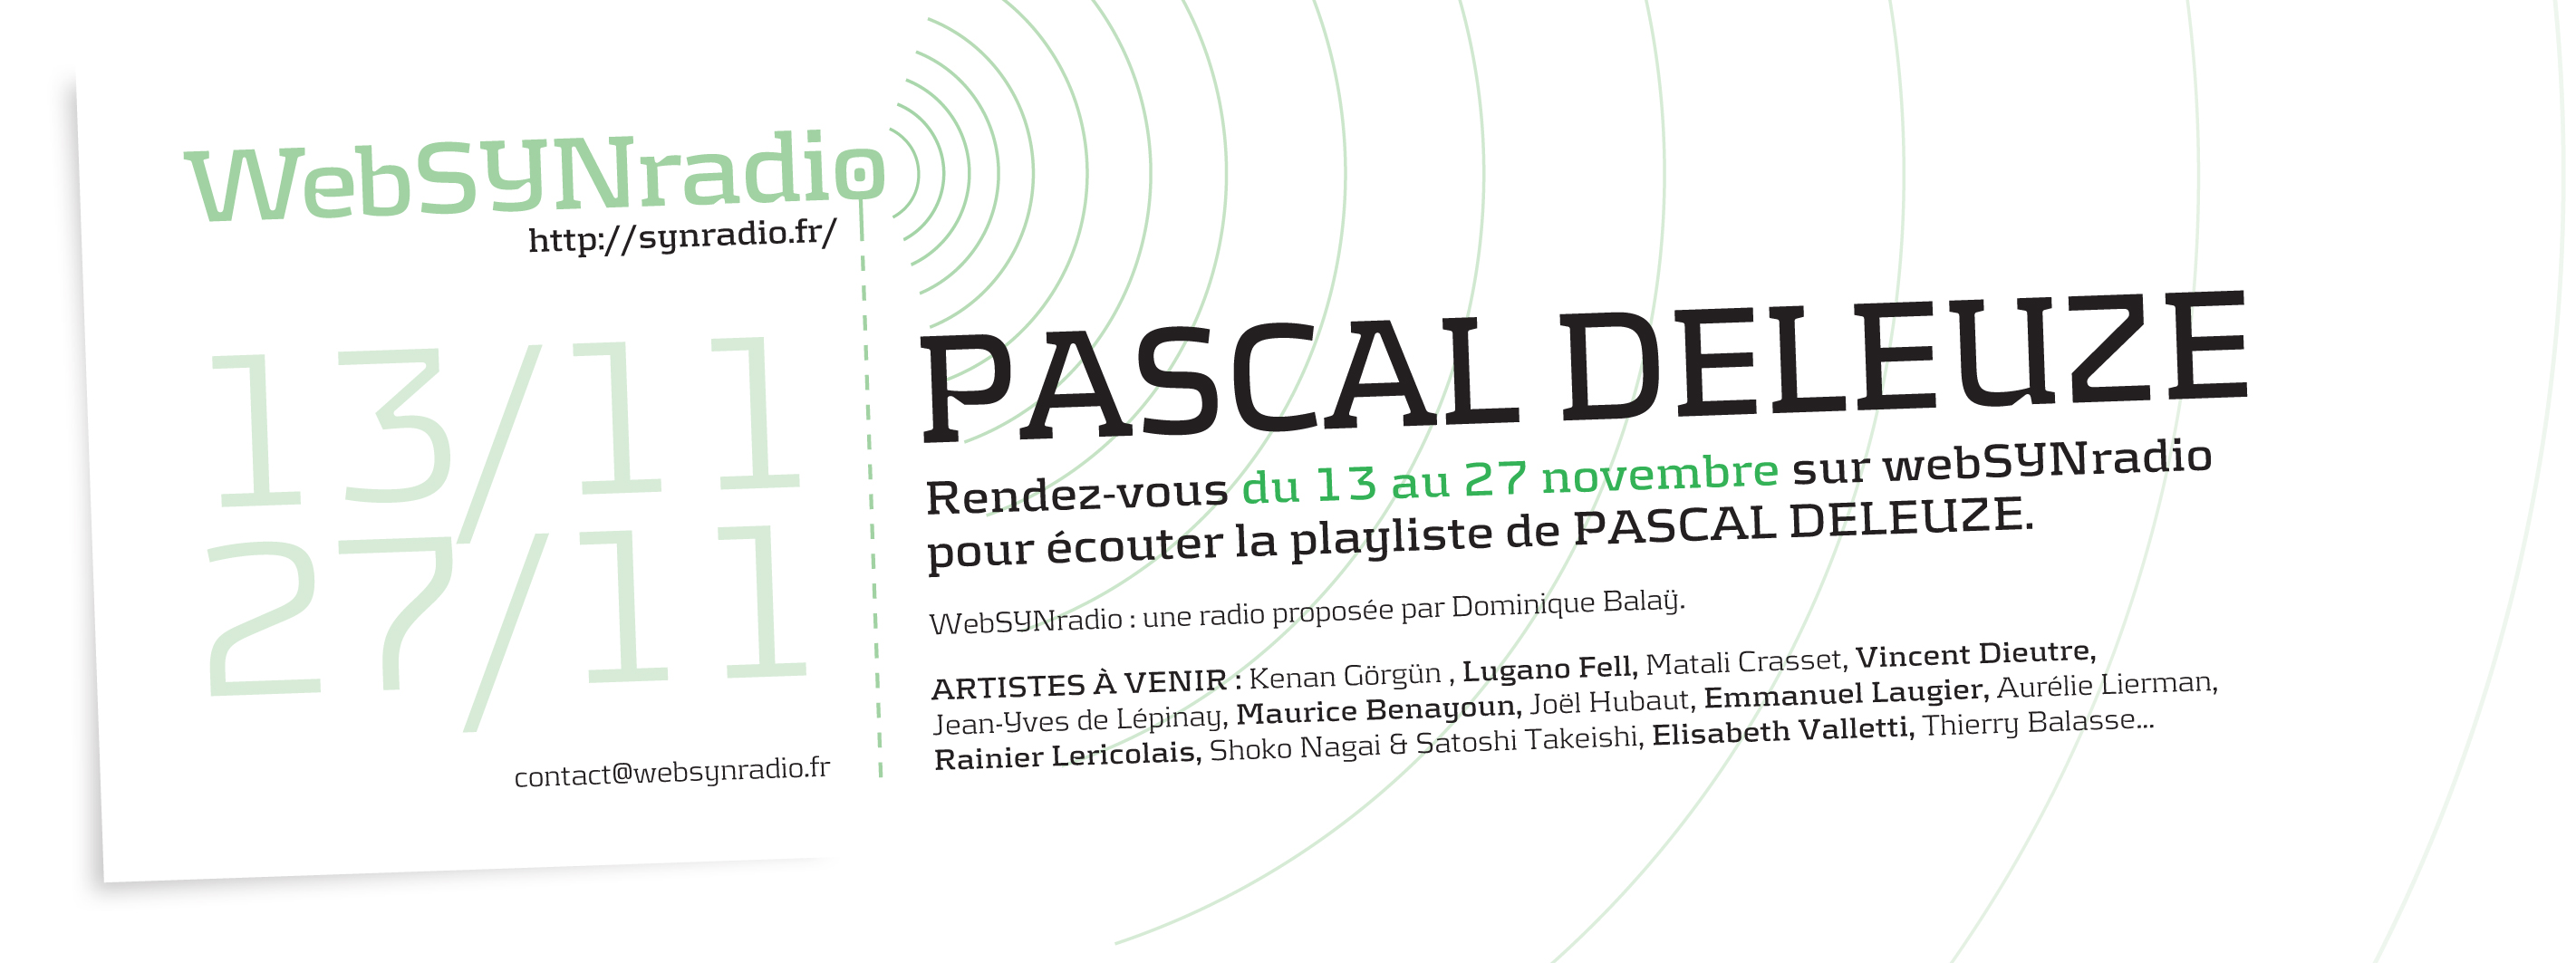 SYN flyer171 Pascal Deleuze fra Actus